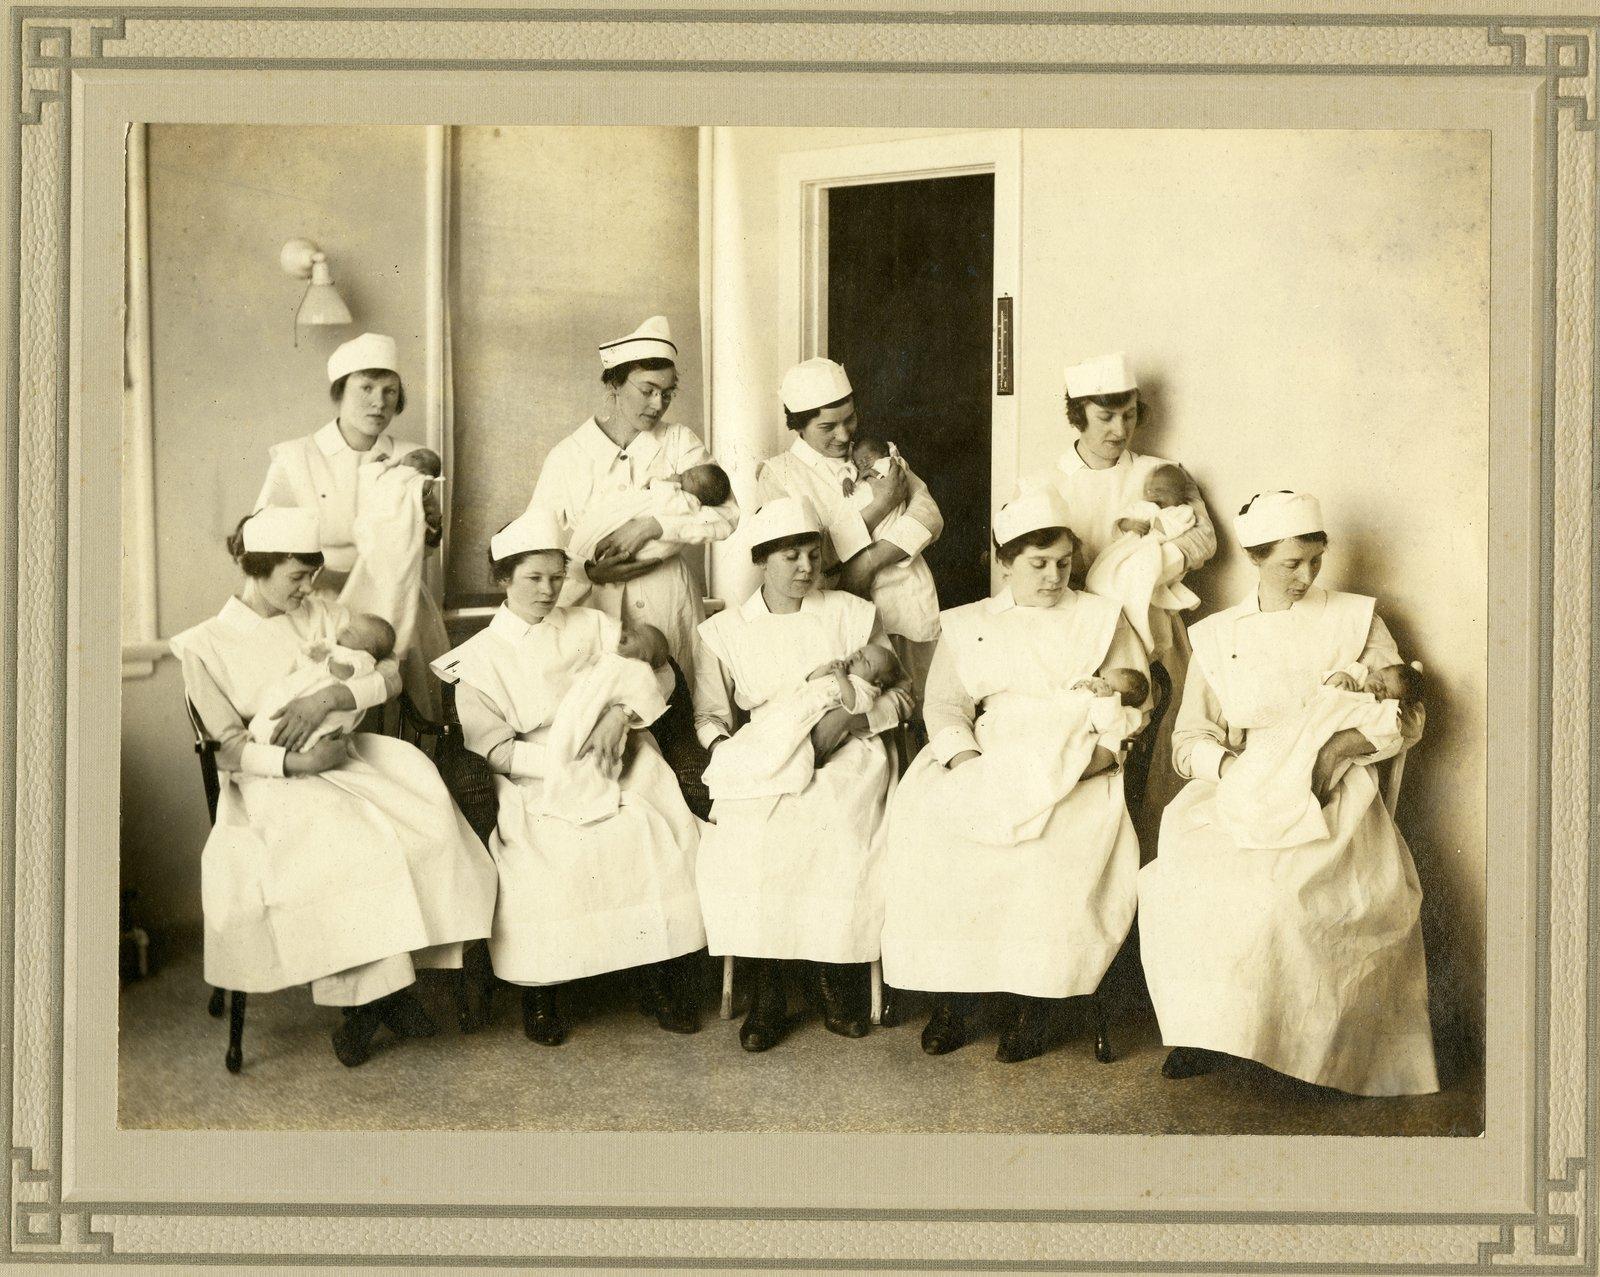 Maternity Ward, c. 1920